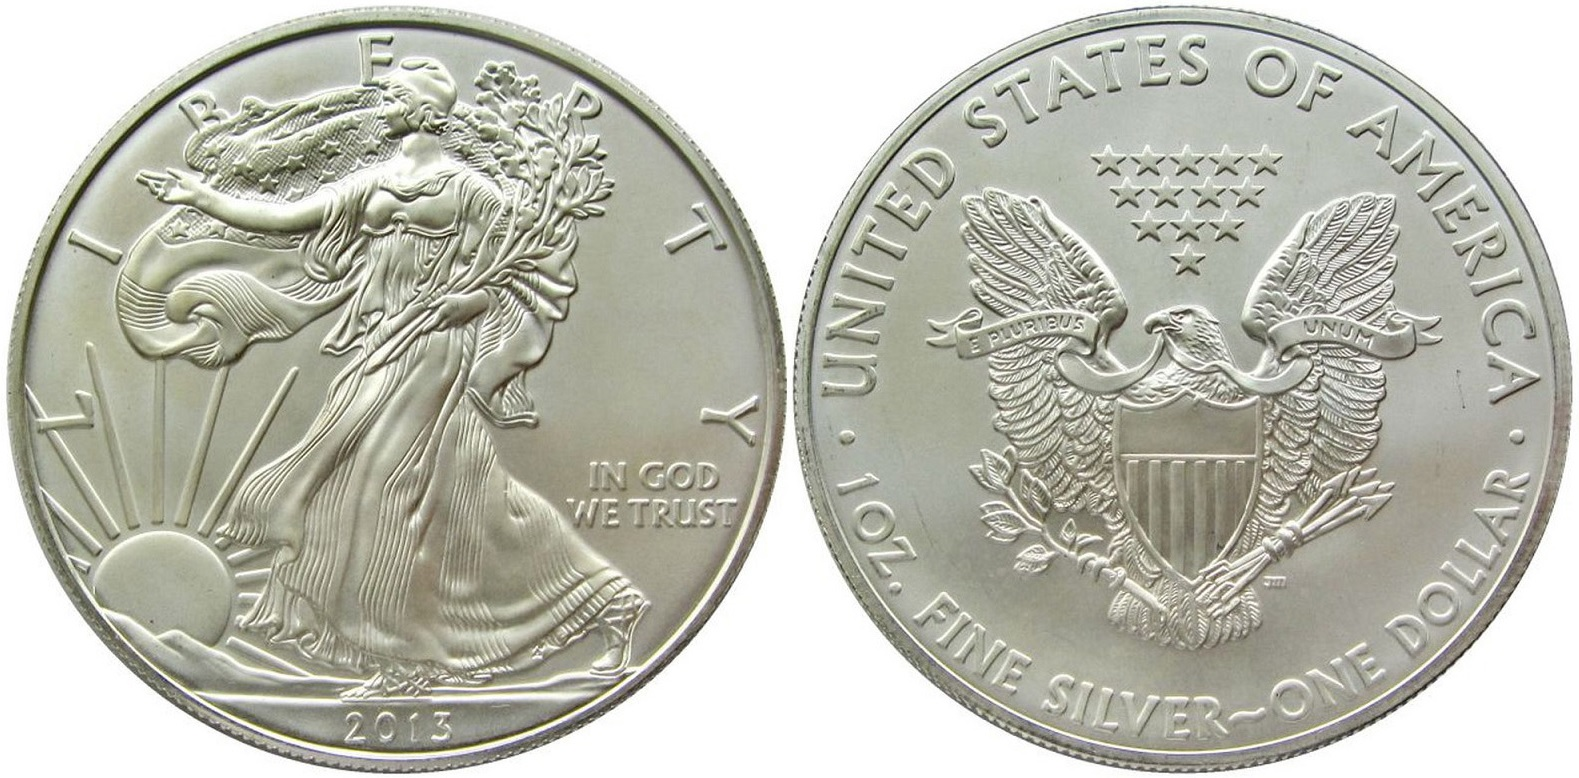 Silver coins of the world. серебряные монеты мира.